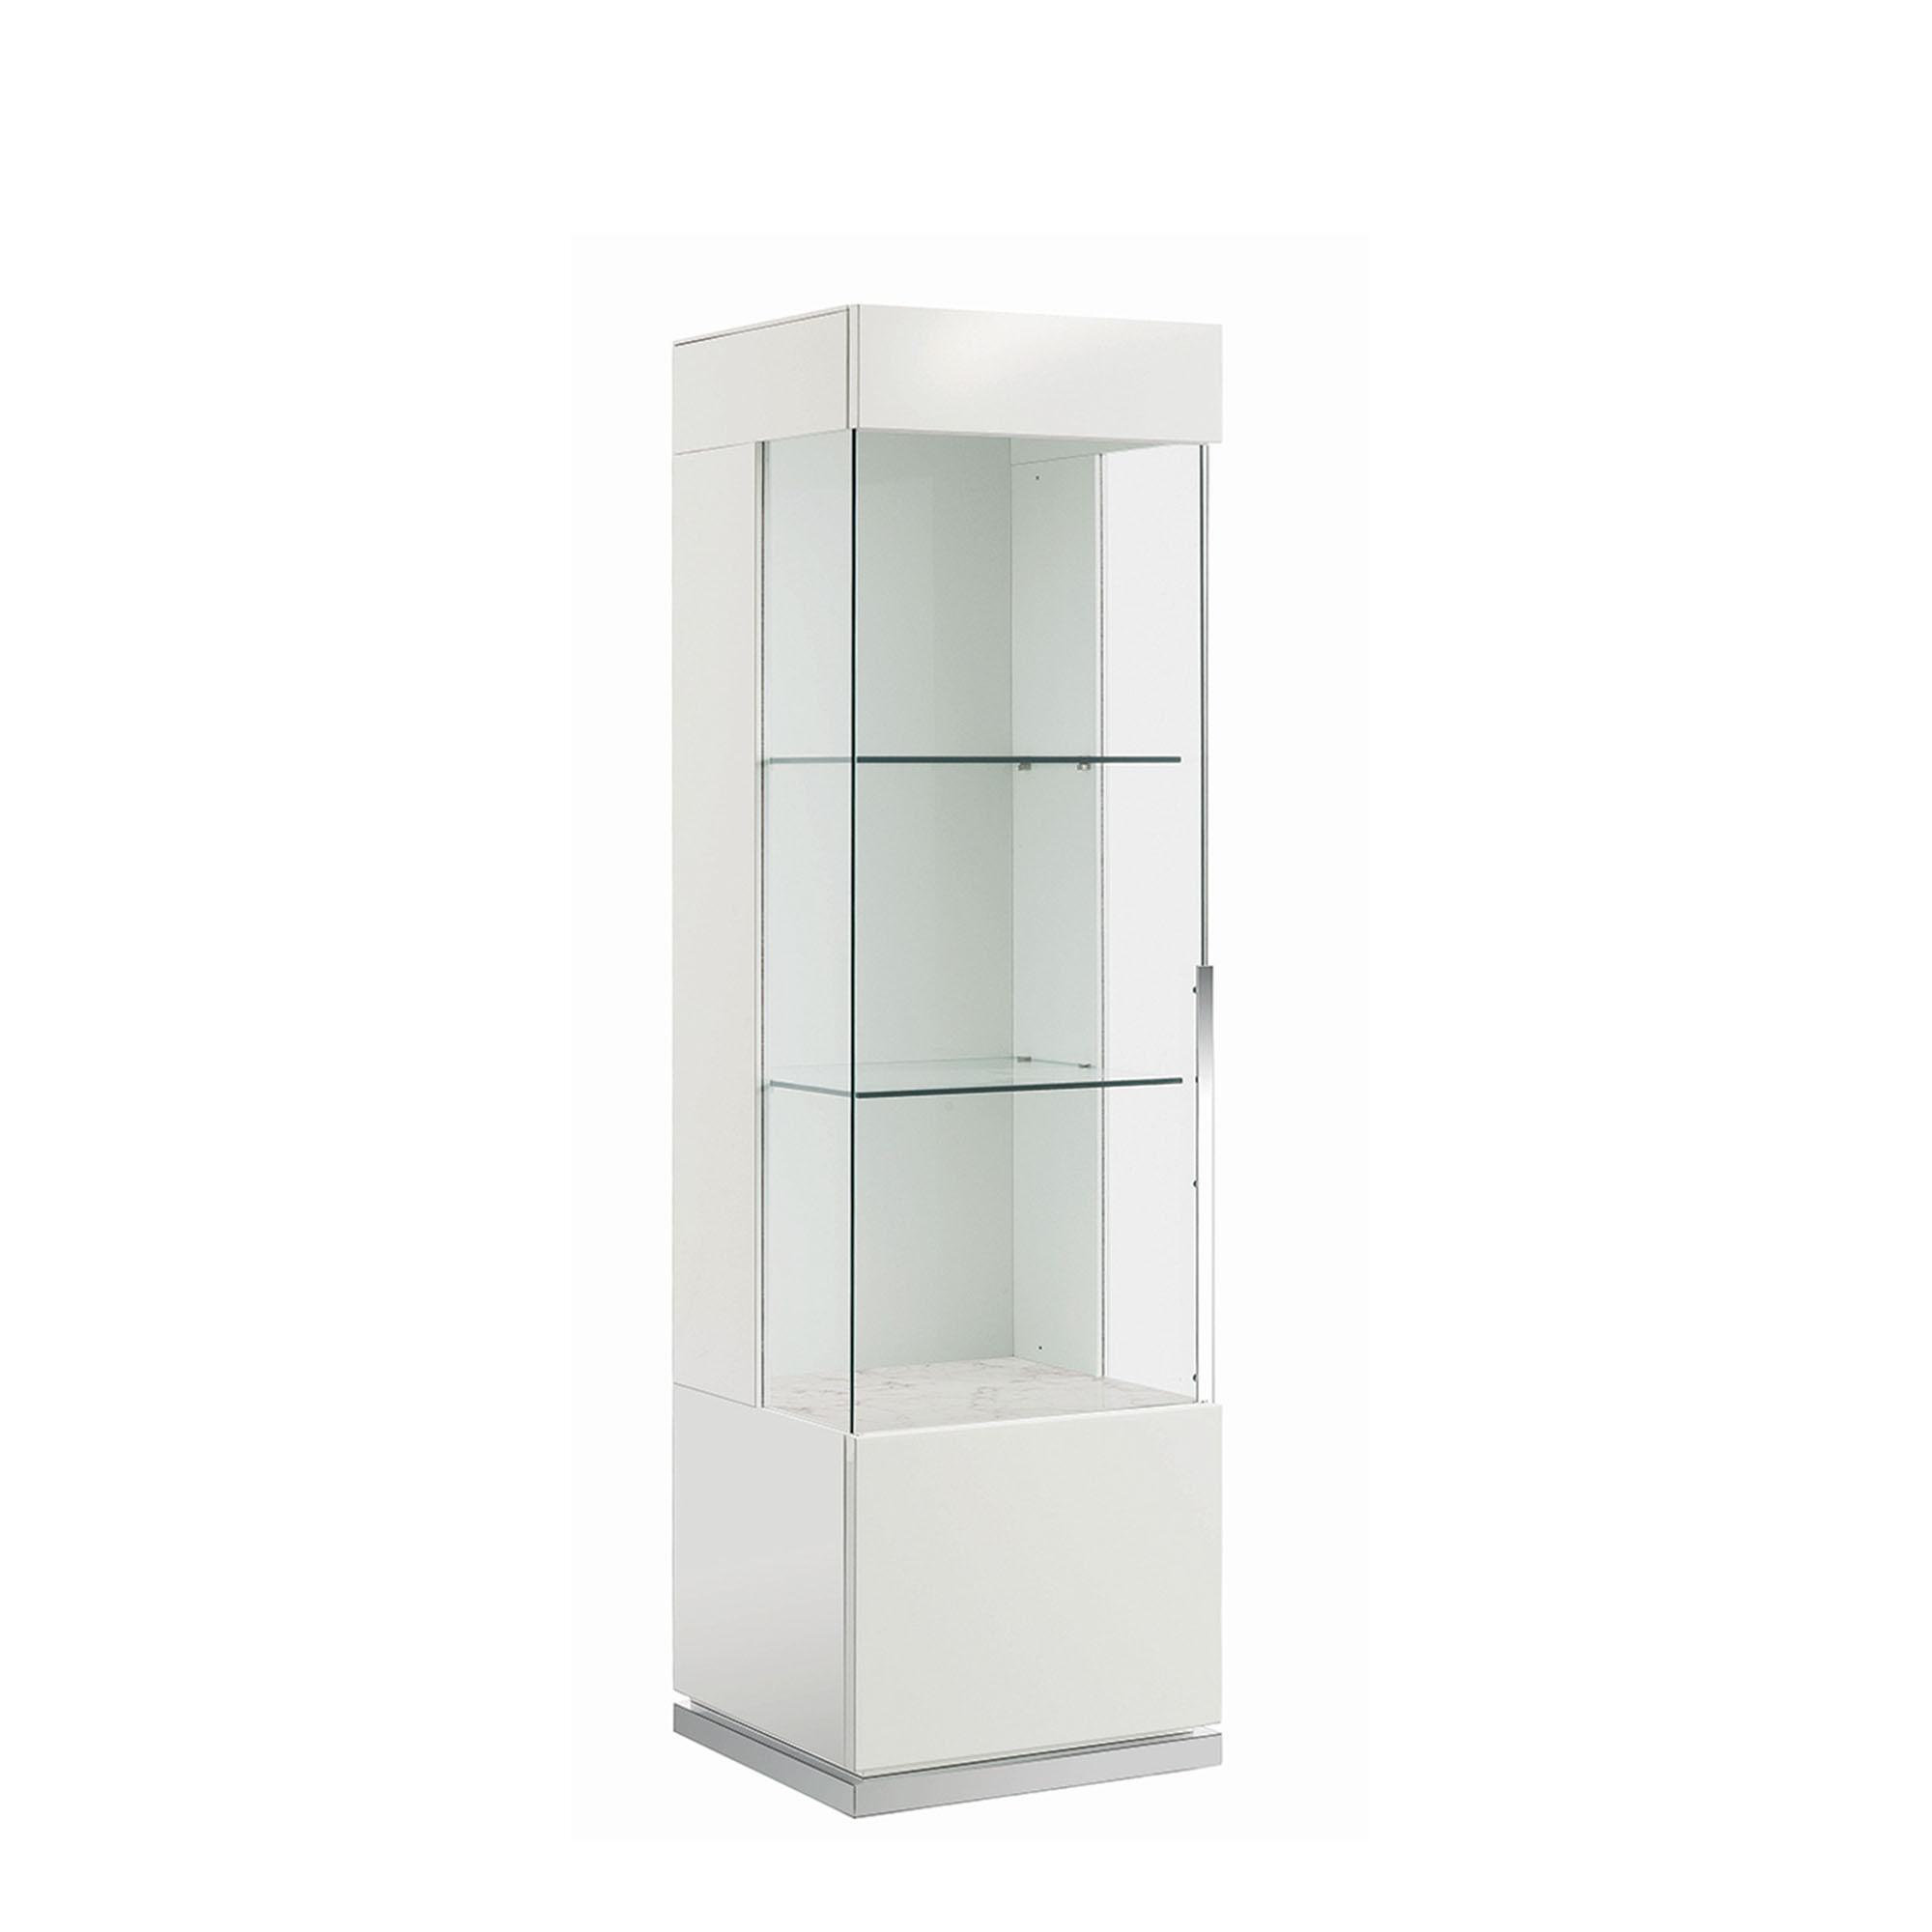 Bernini 1 Door Left Curio Cabinet White High Gloss Display Cabinets Fishpools